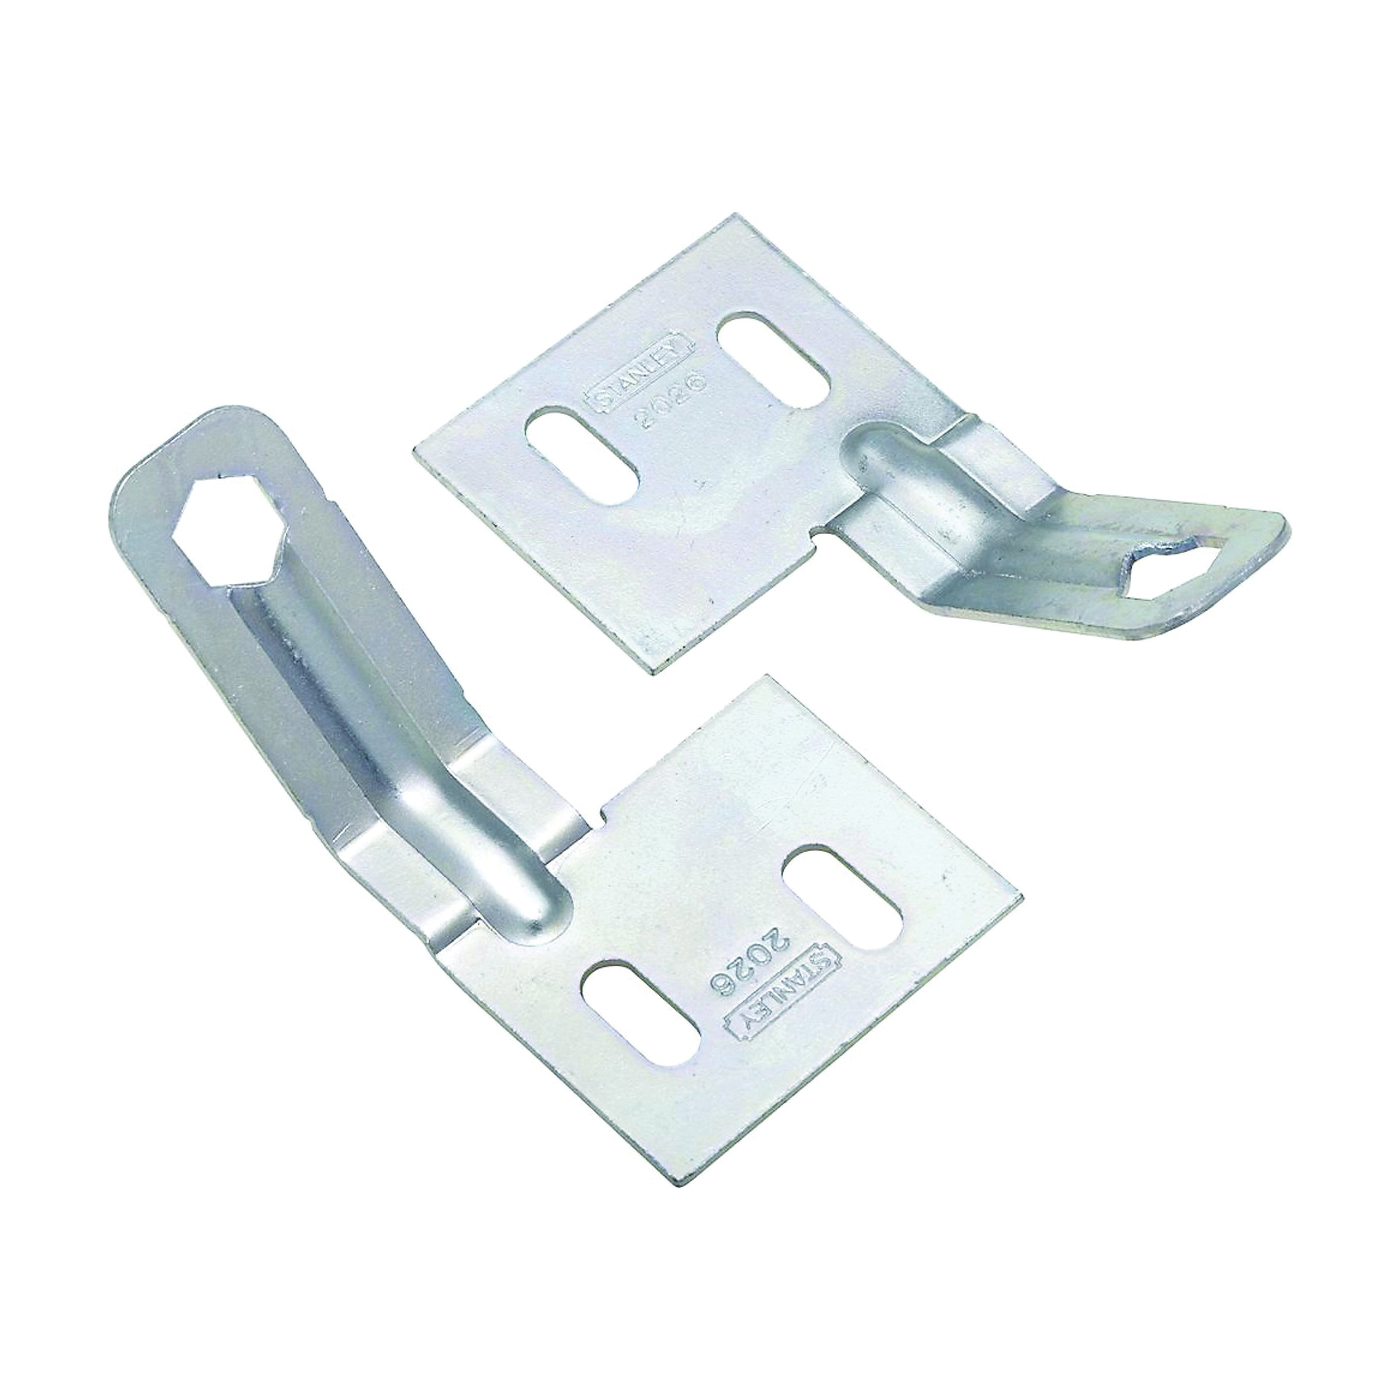 Picture of National Hardware V391A Series N344-895 Folding Door Aligner, Steel, Zinc, 2